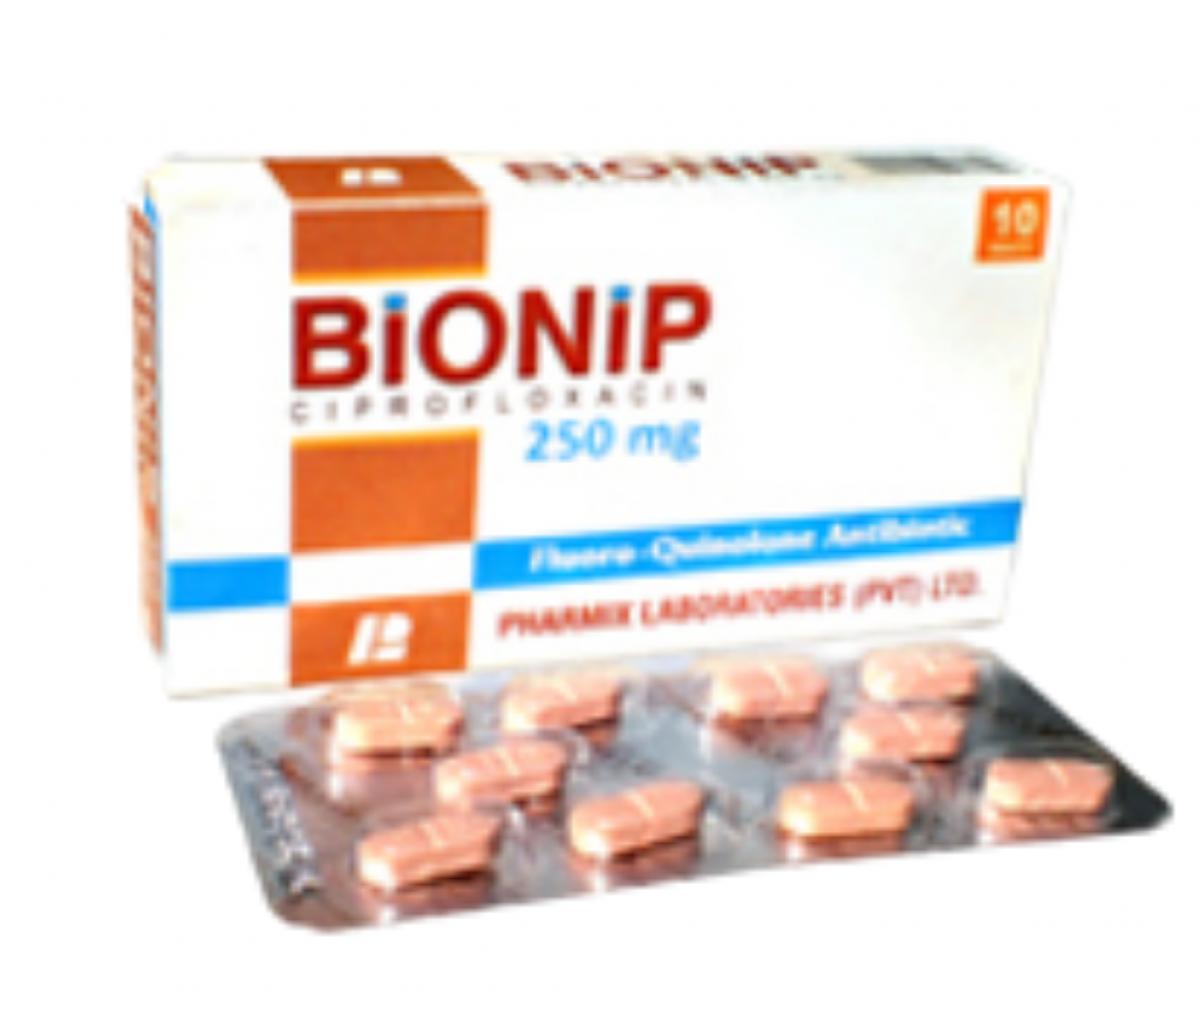 Bionip 500mg USP Tablet